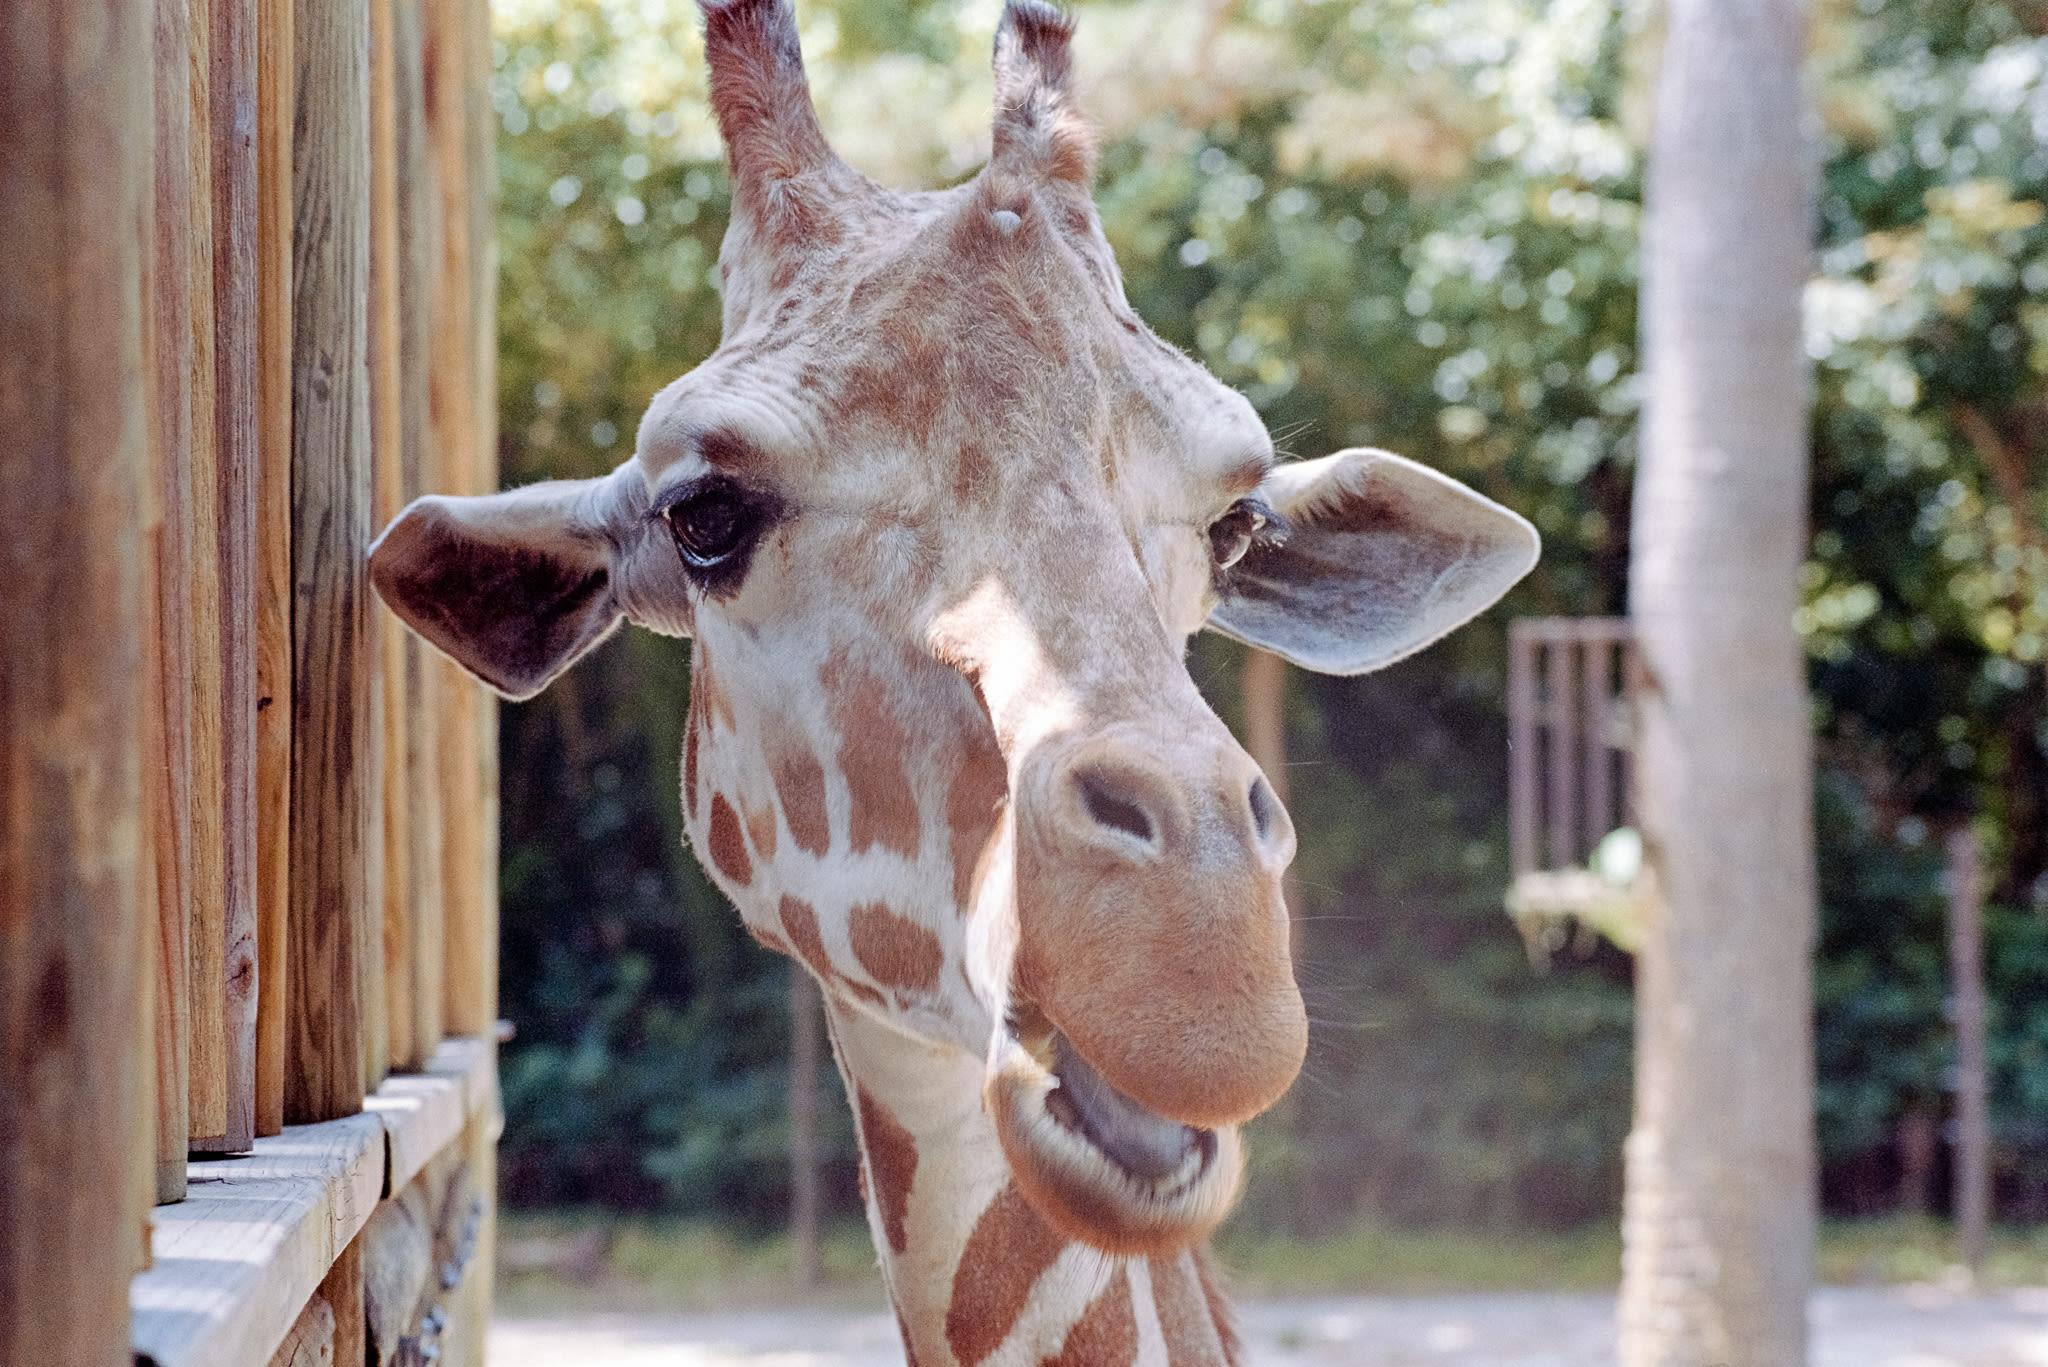 upclose of giraffe face